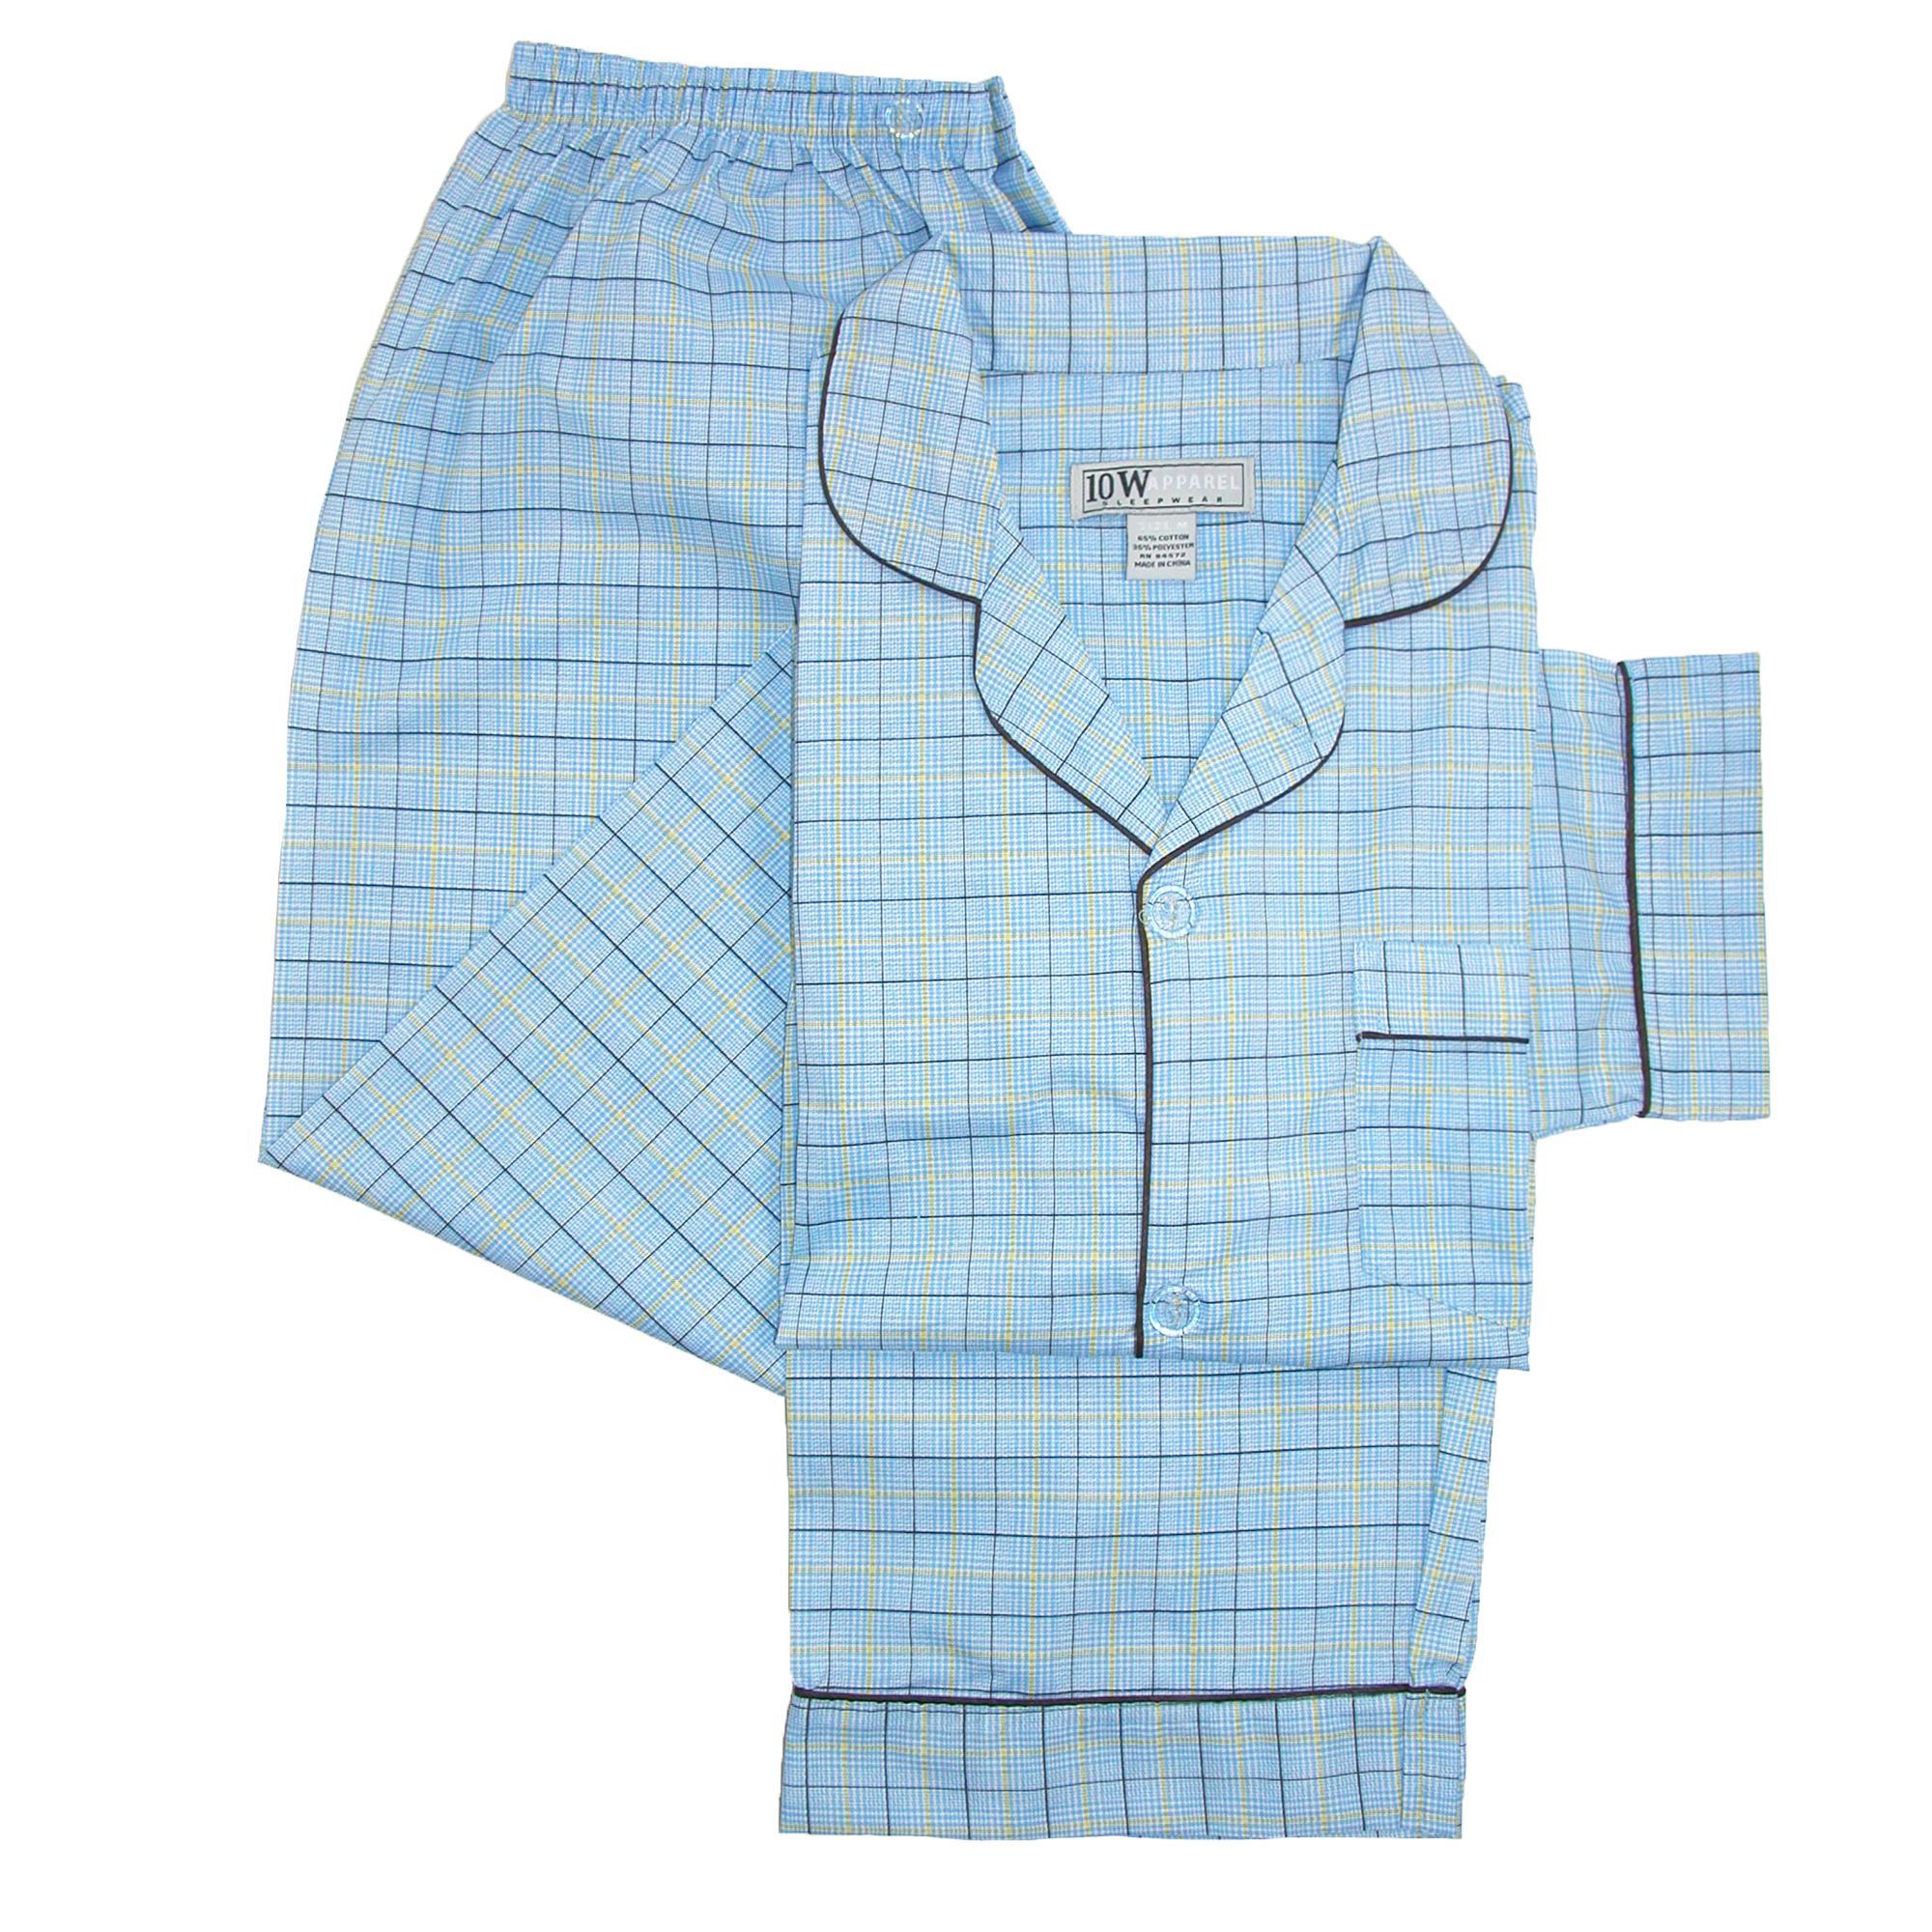 New-Ten-West-Apparel-Men-039-s-Tall-Long-Sleeve-Long-Leg-Pajamas